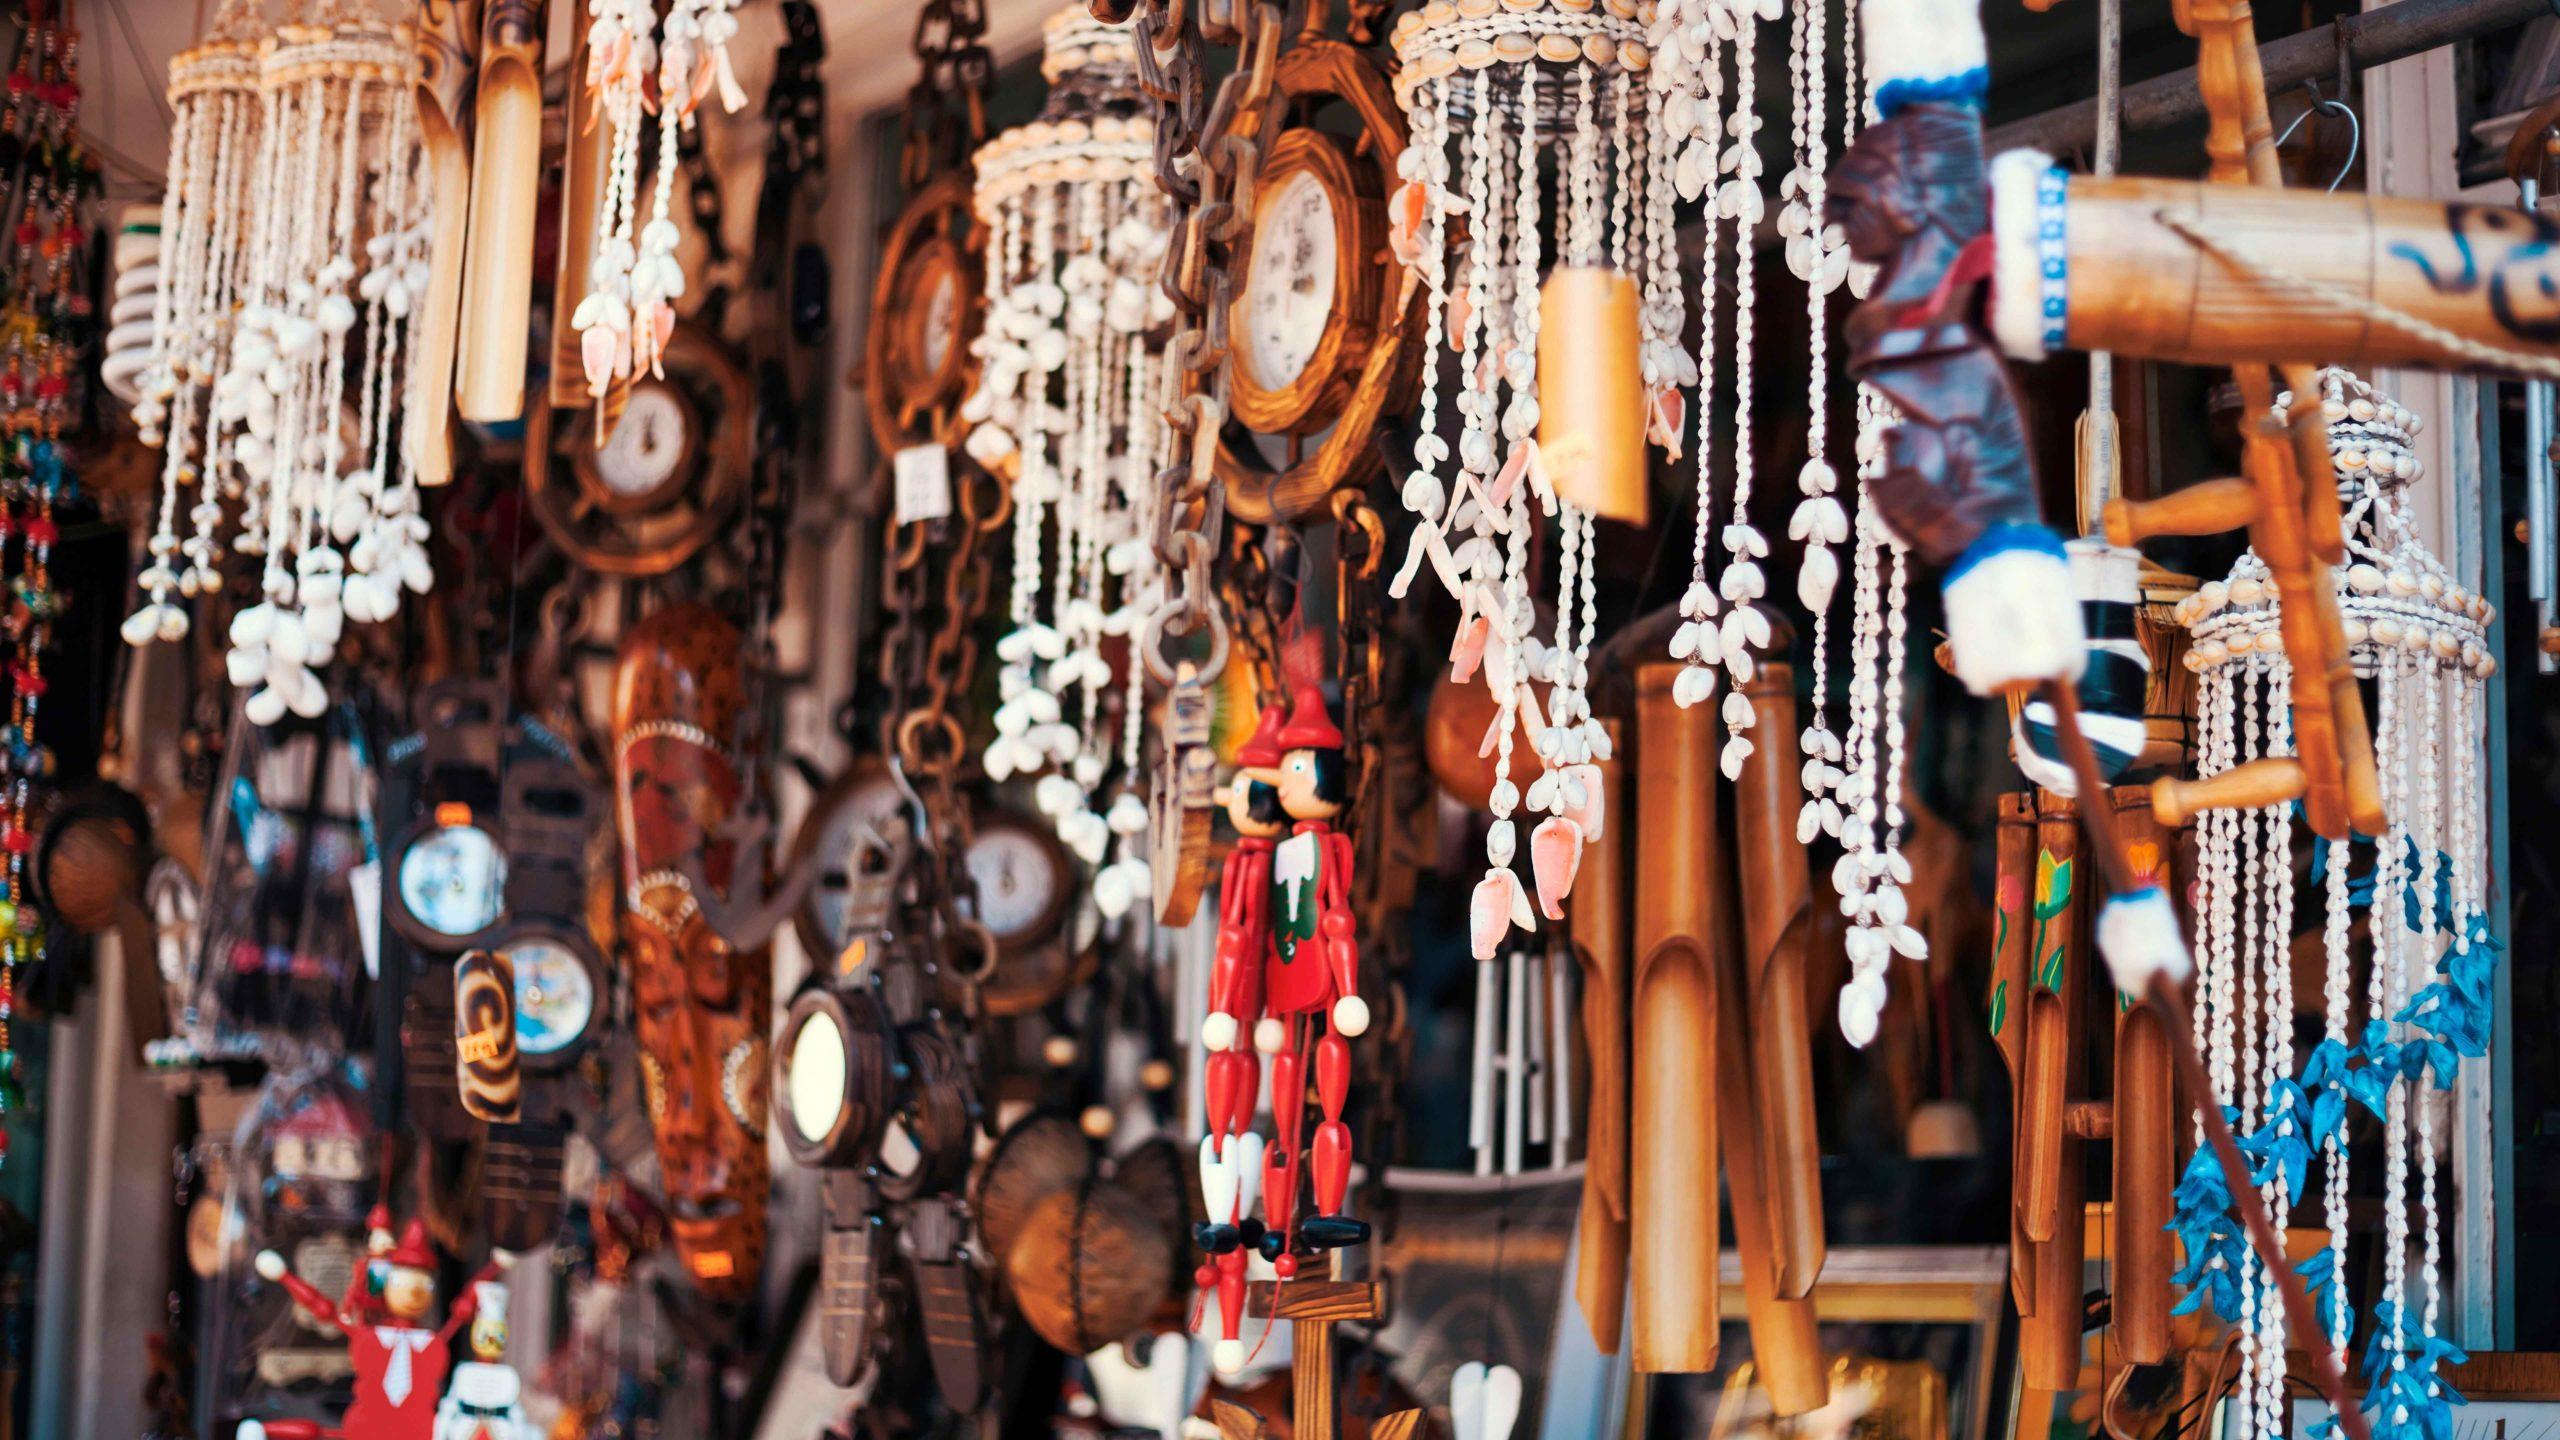 Bazares en Aranjuez